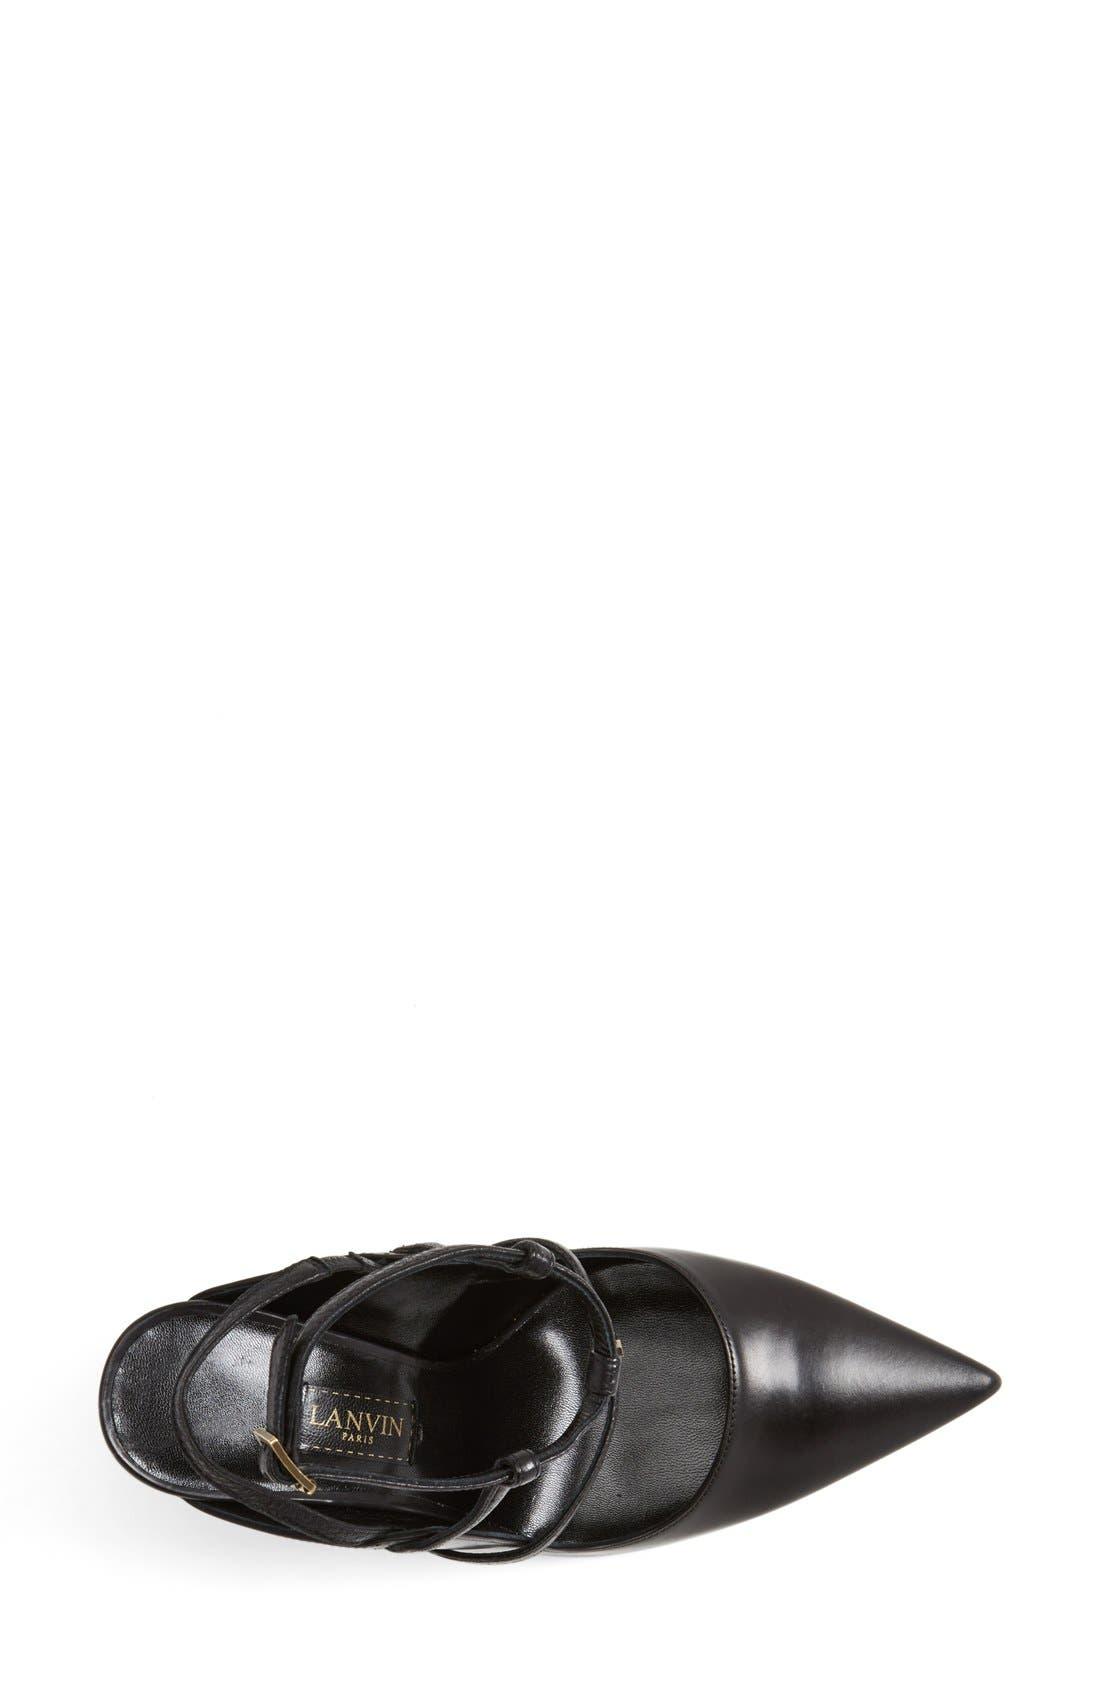 Alternate Image 3  - Lanvin Studded T-Strap Leather Pump (Women)